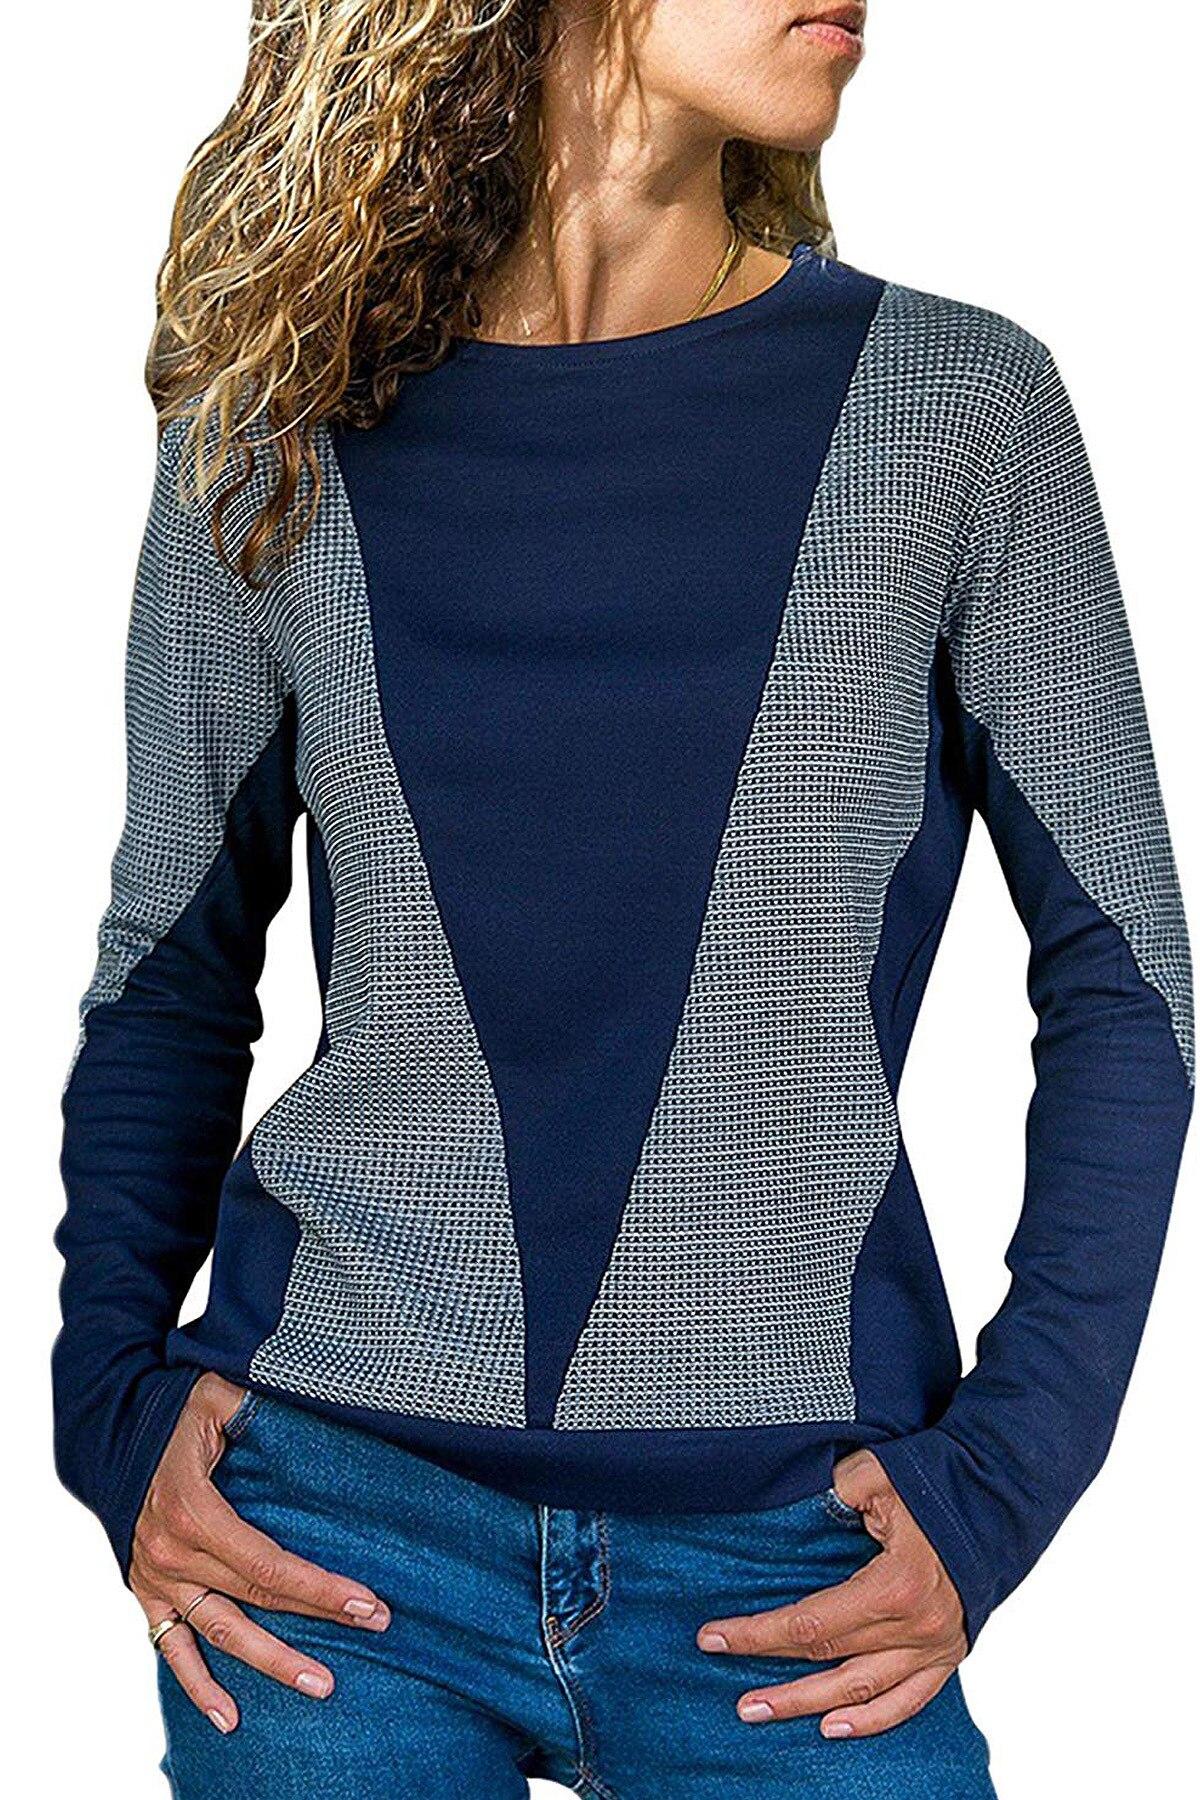 2018 Autumn fashion hot selling USA and Europian women O-neck long sleeves sports coat